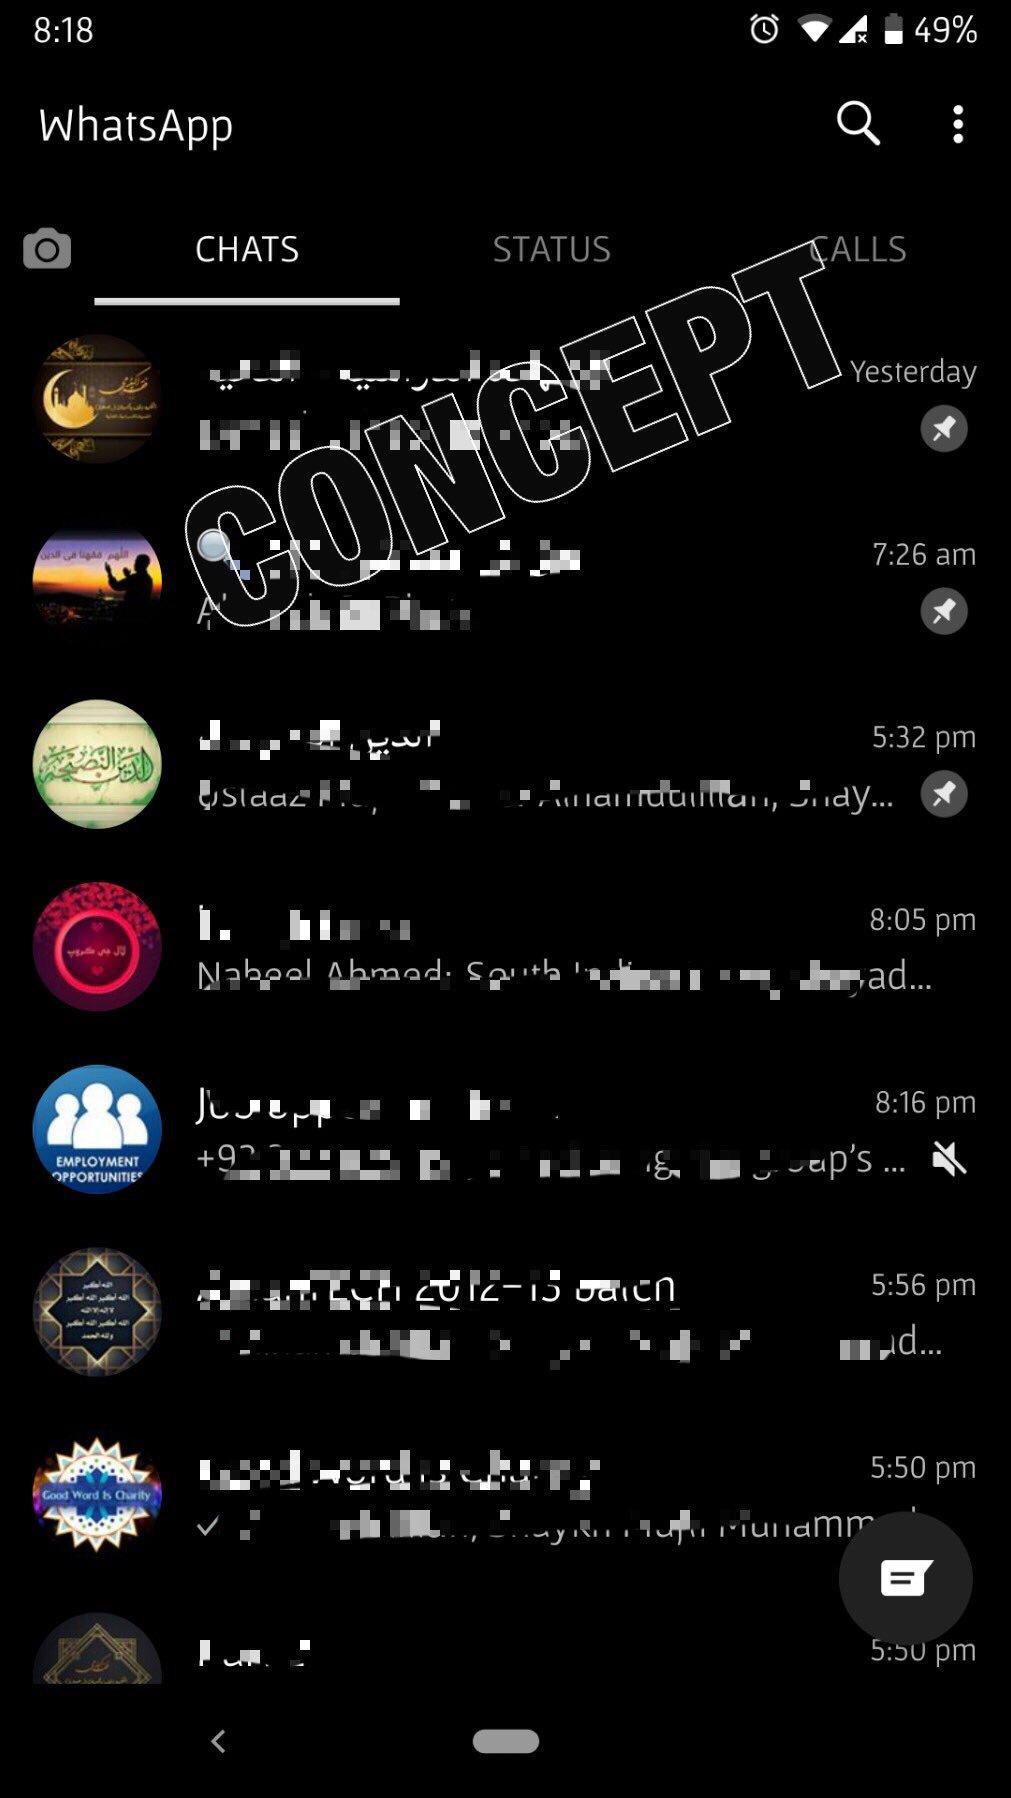 WhatsApp dark mode concept